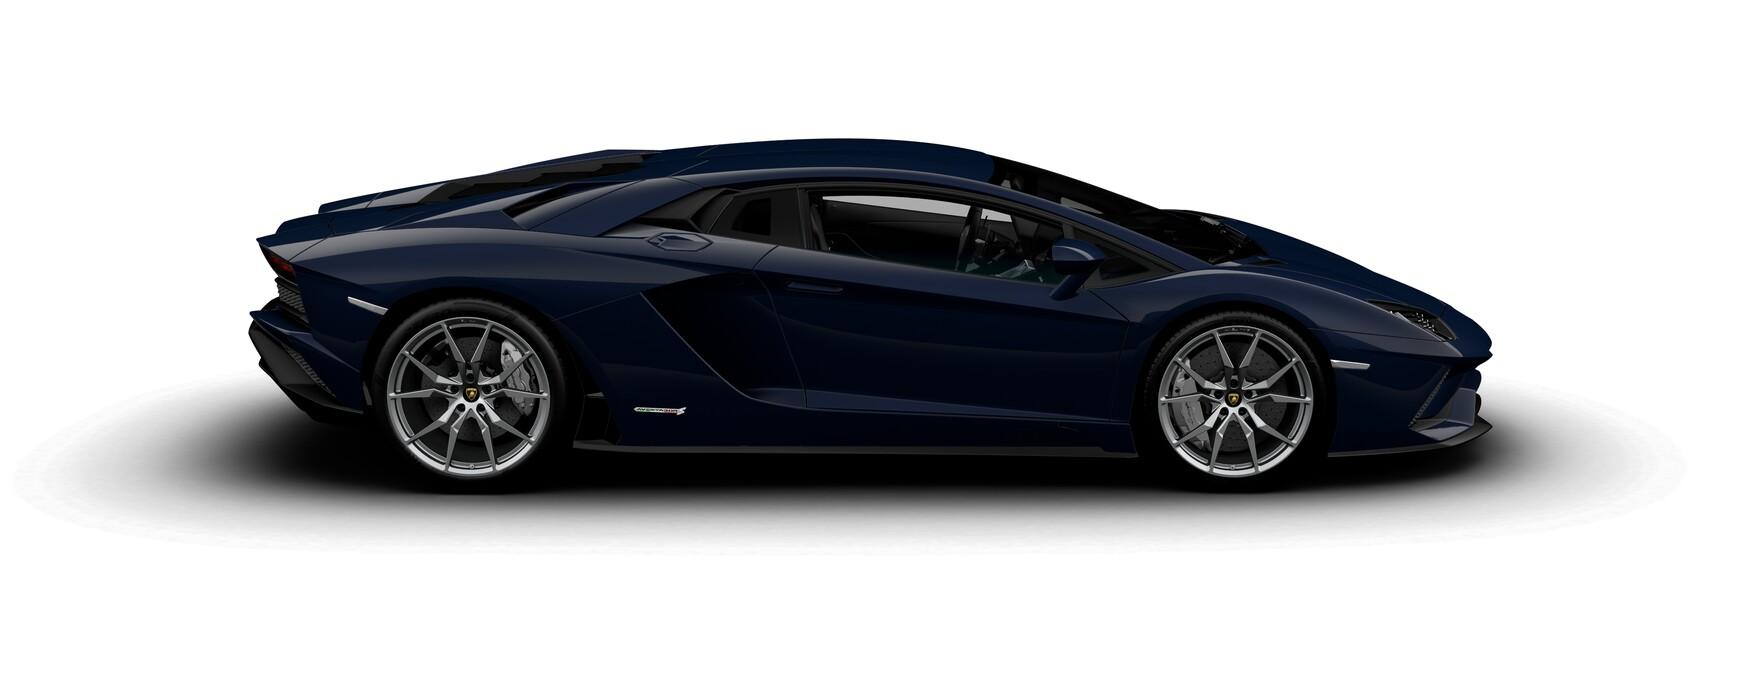 Lamborghini Aventador S Coupe metallic Blu Hera side view